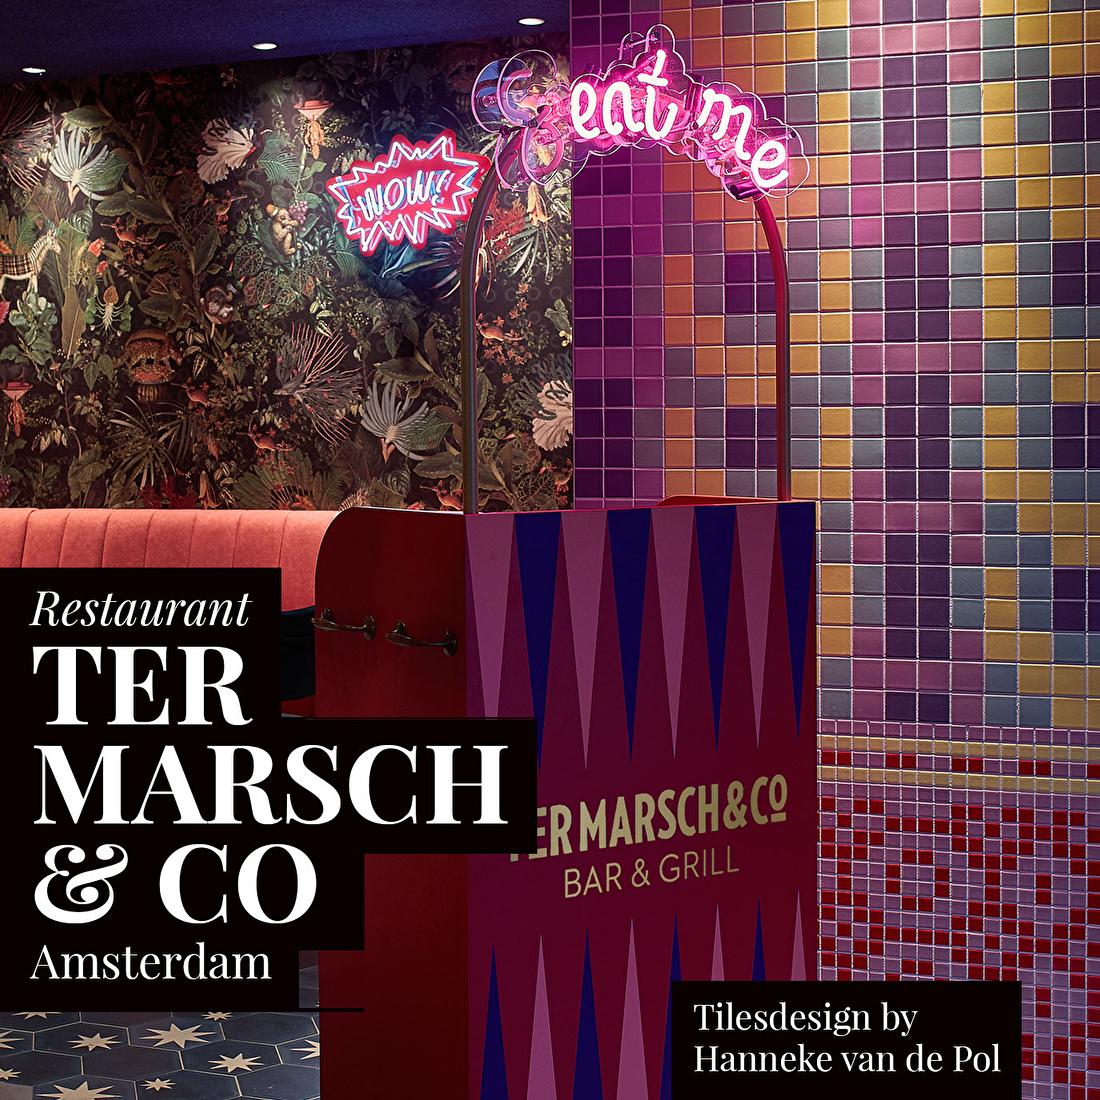 Ter Marsch& Co, Bloemenmarkt Amsterdam